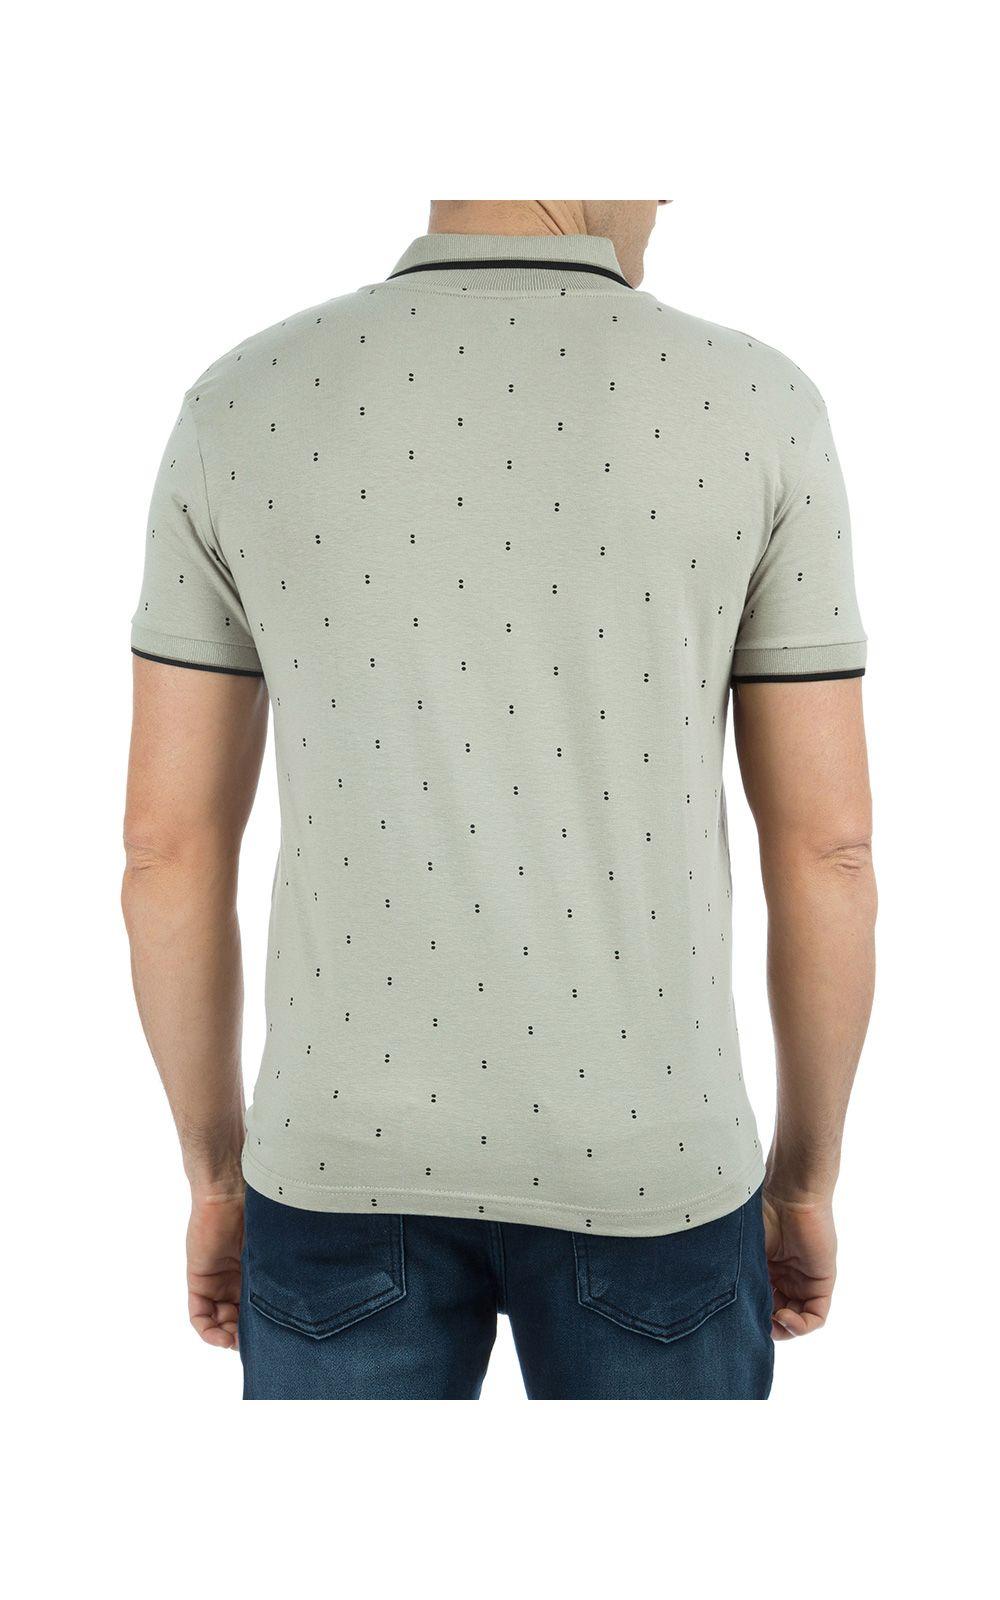 Foto 2 - Camisa Polo Masculina Cinza Estampada